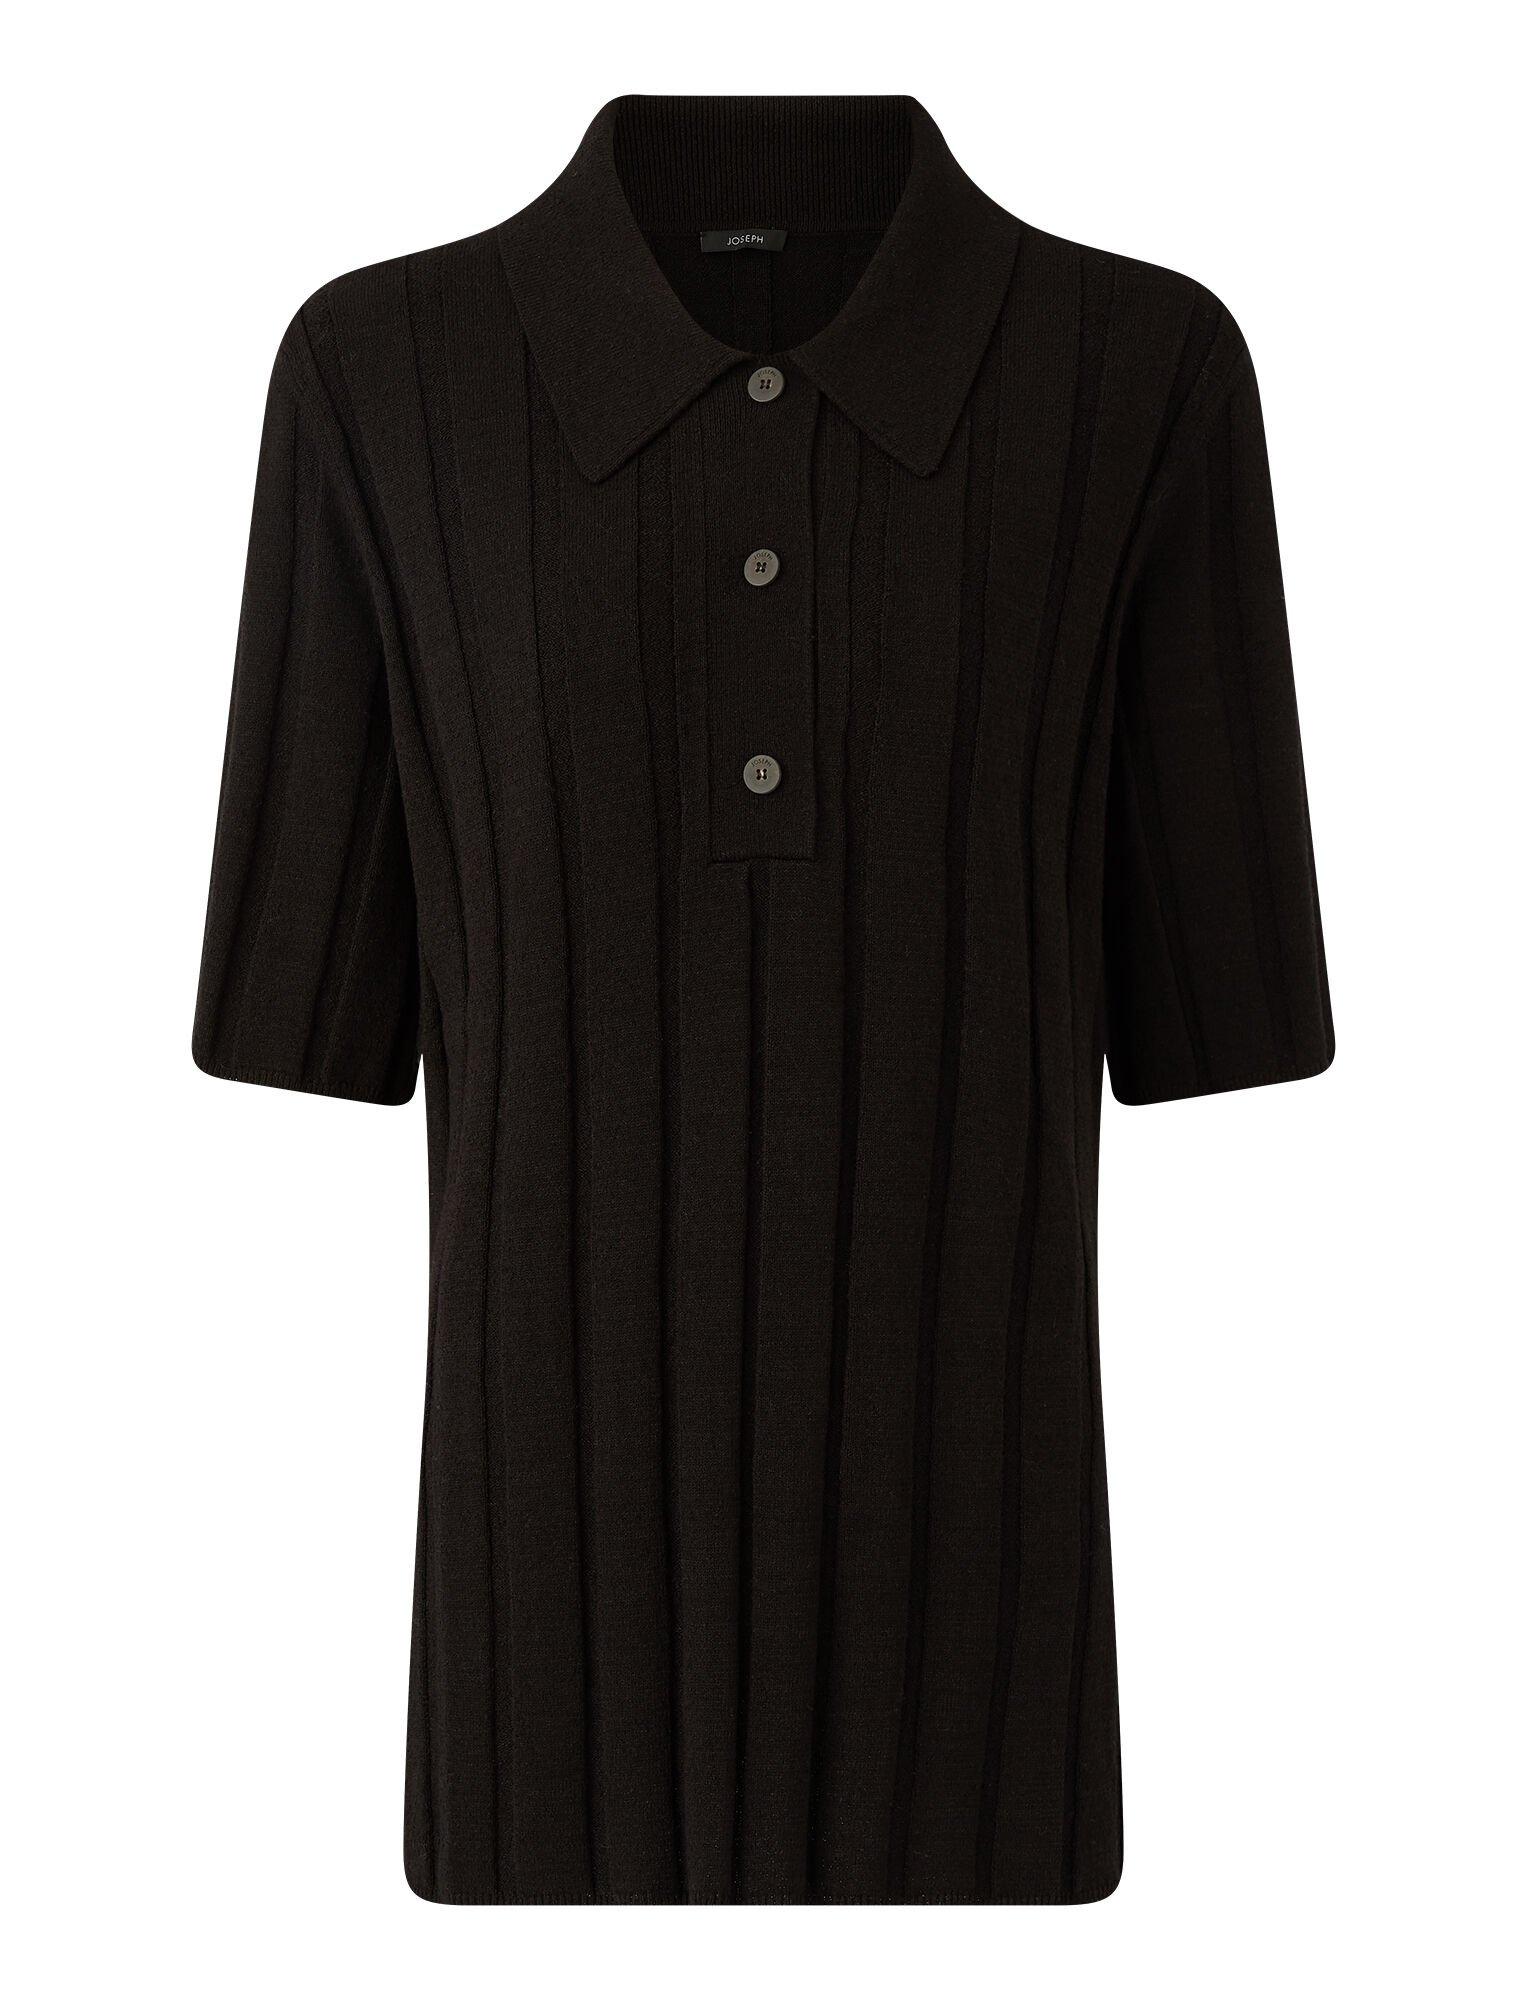 Joseph, Textured Rib Polo Top, in BLACK